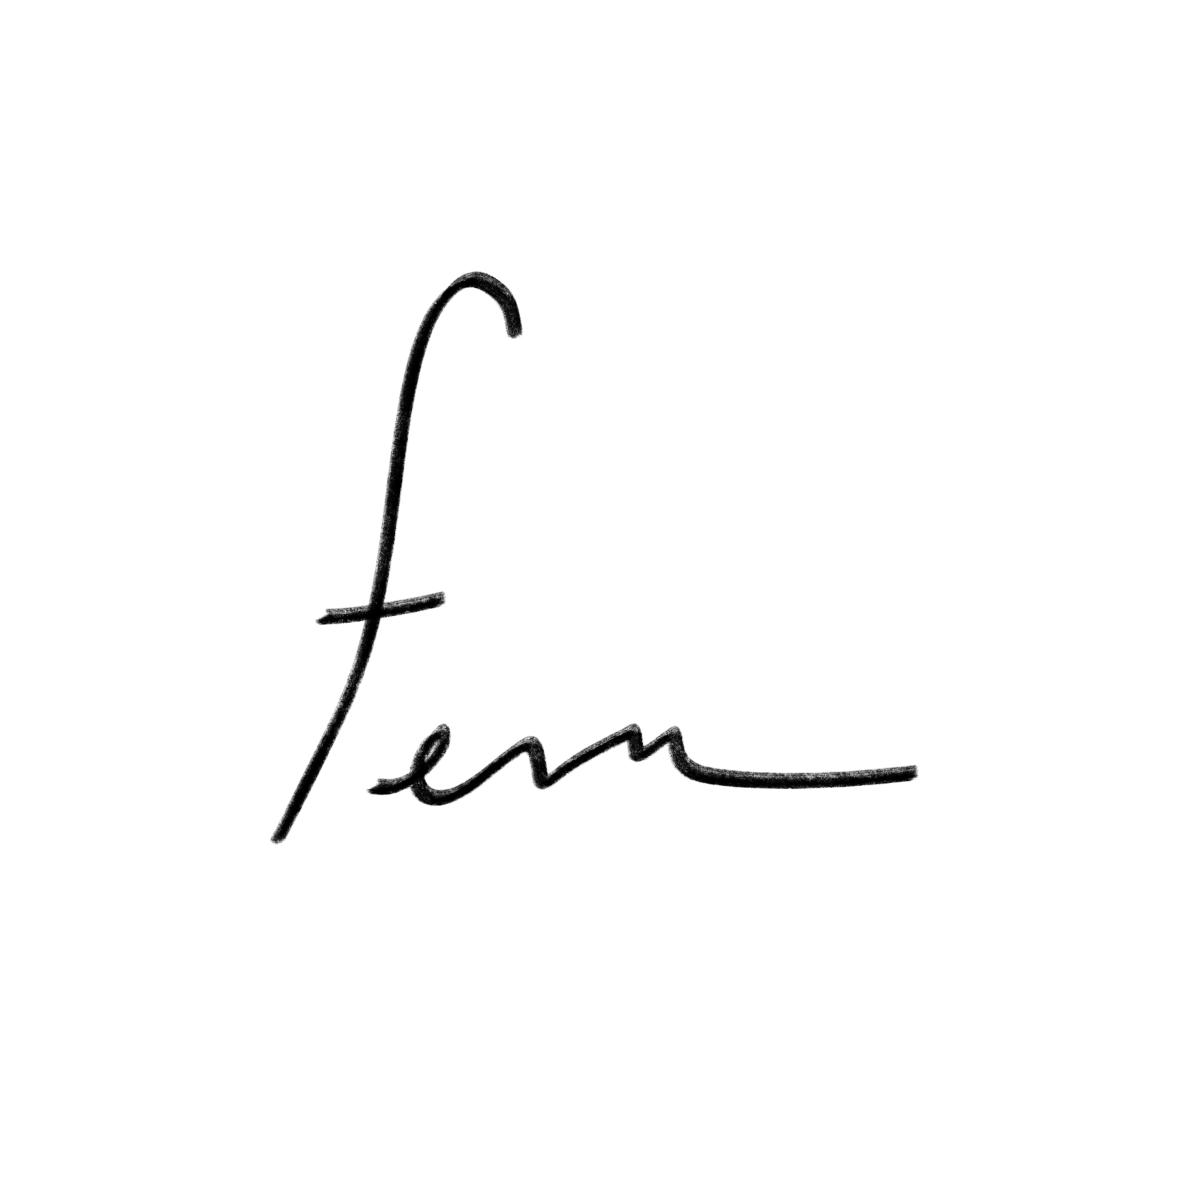 Fern - album art